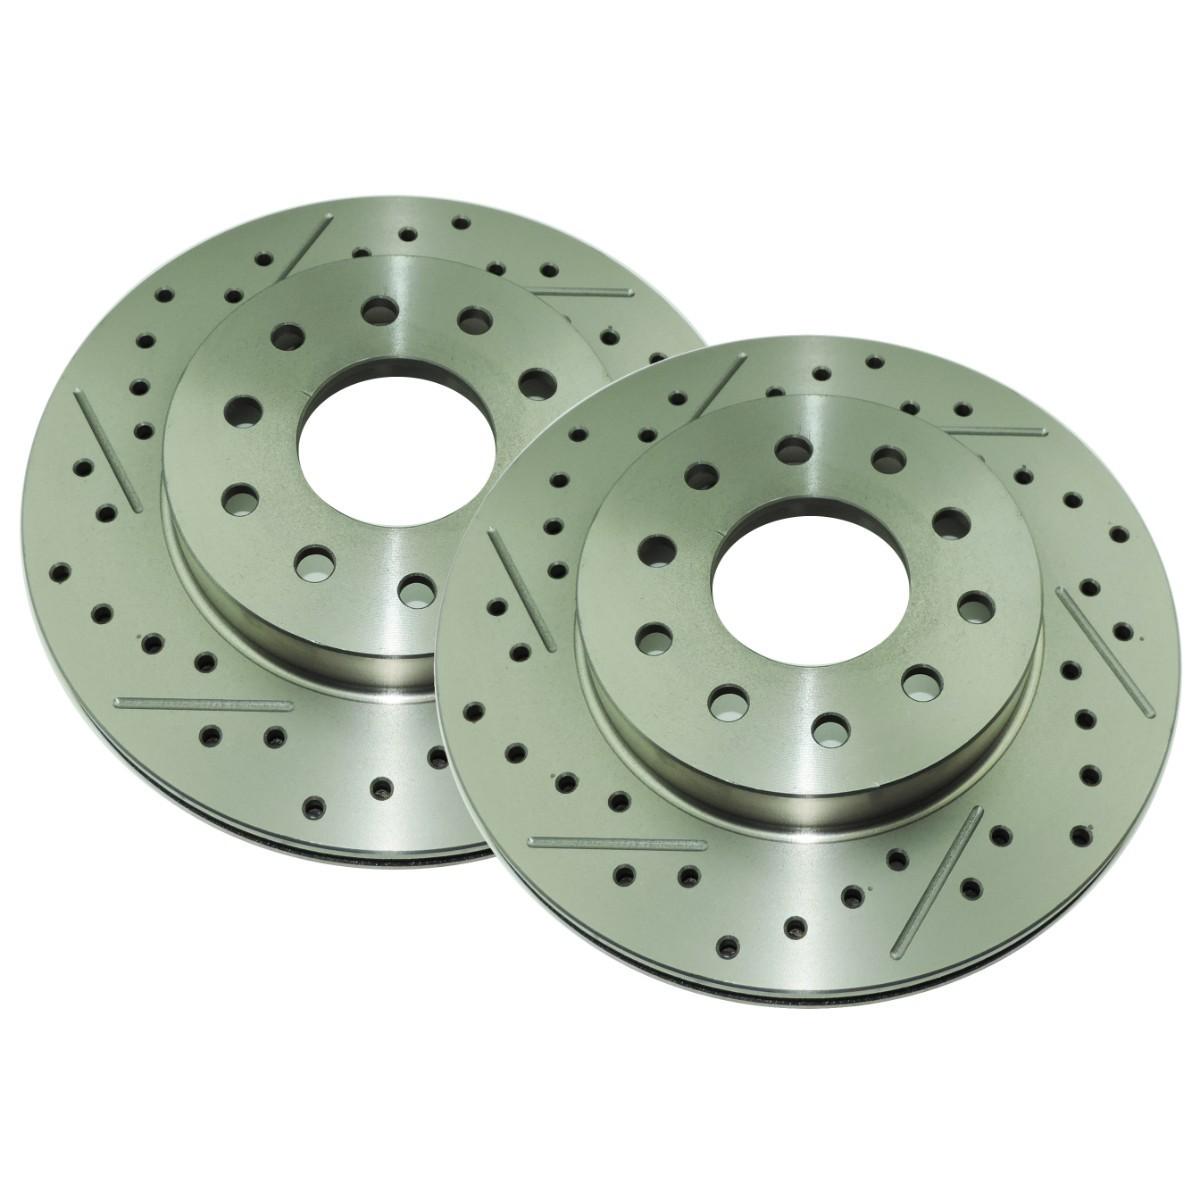 78-88 G-body Master Cylinder to Proportioning Valve Brake Lines OEM Steel 2pc